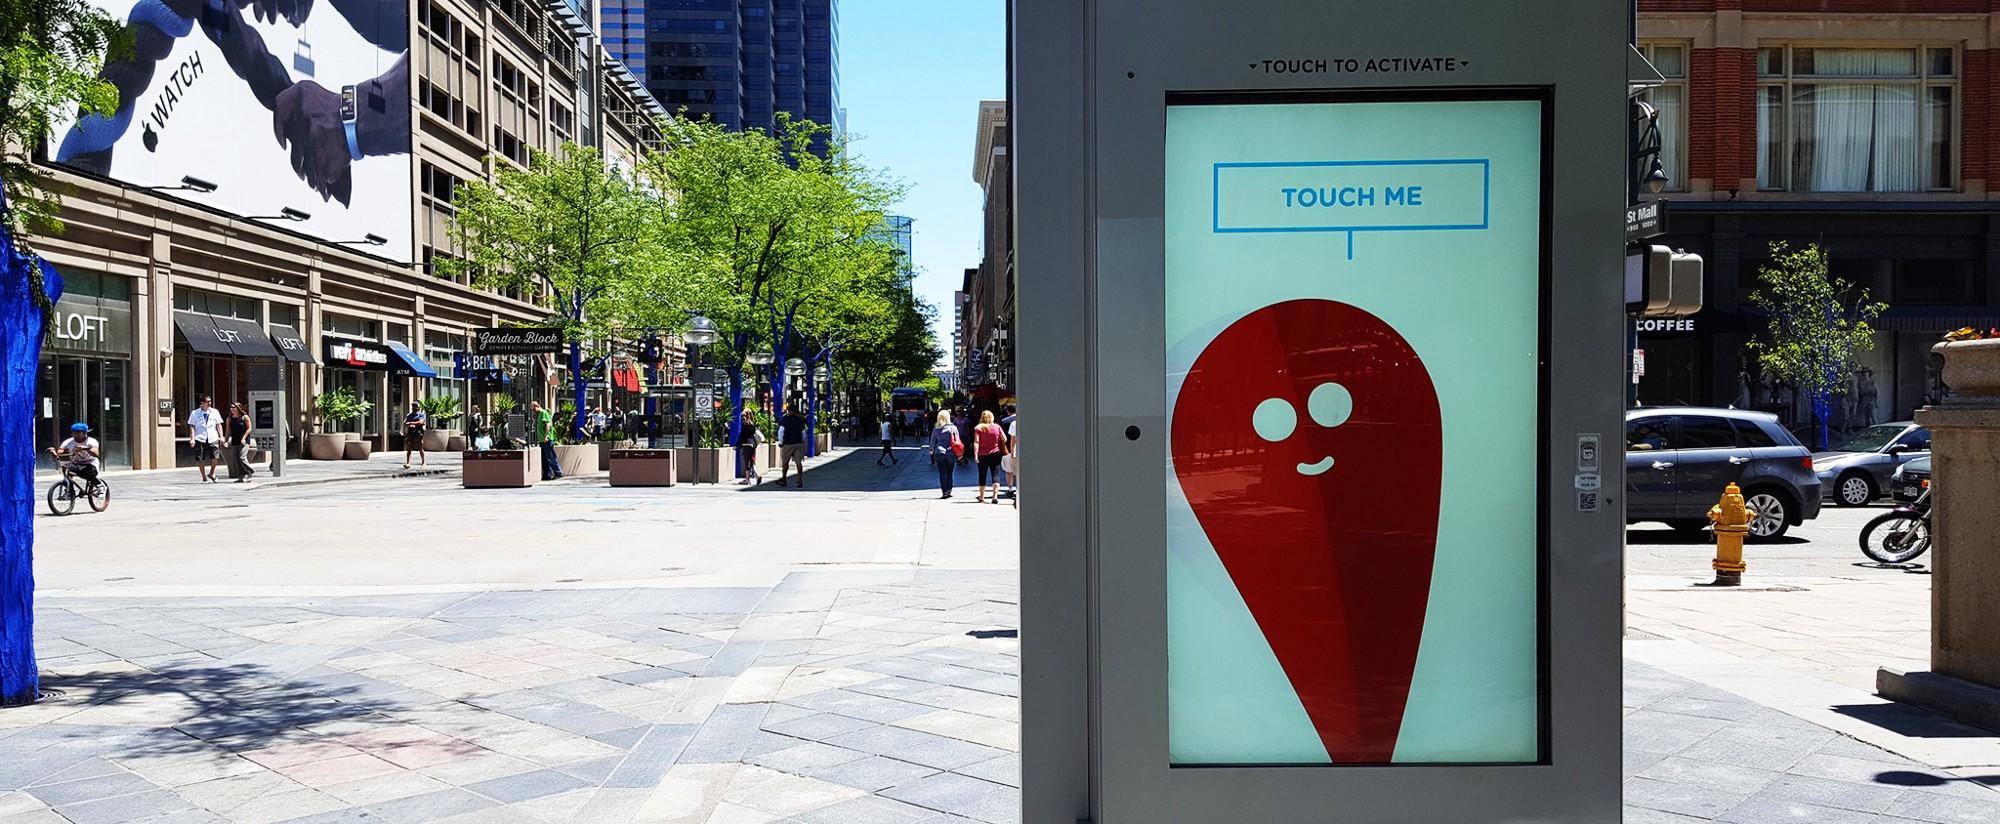 Interactive kiosk, Denver, Colorado. Photo by Dan Lockton